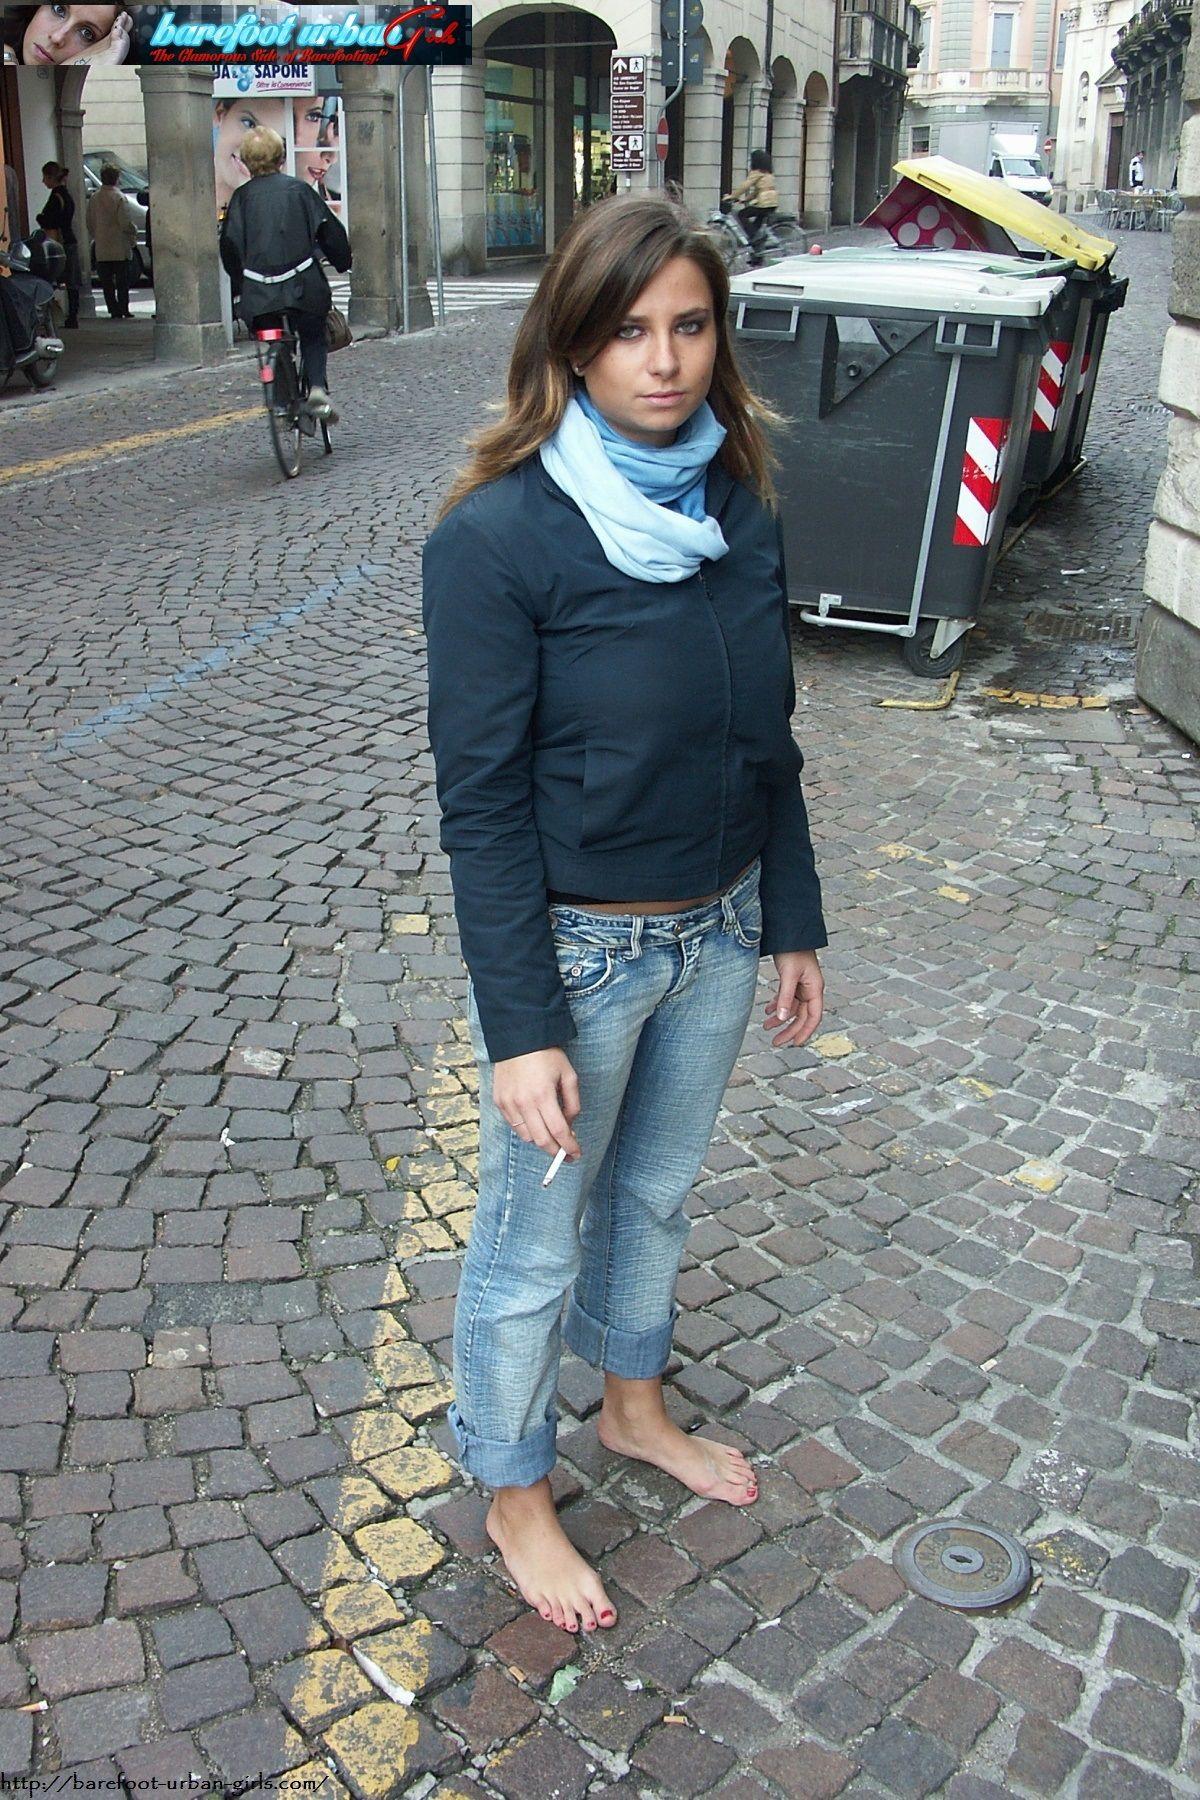 Pin Alex Gabriel Barefoot Urban Girls